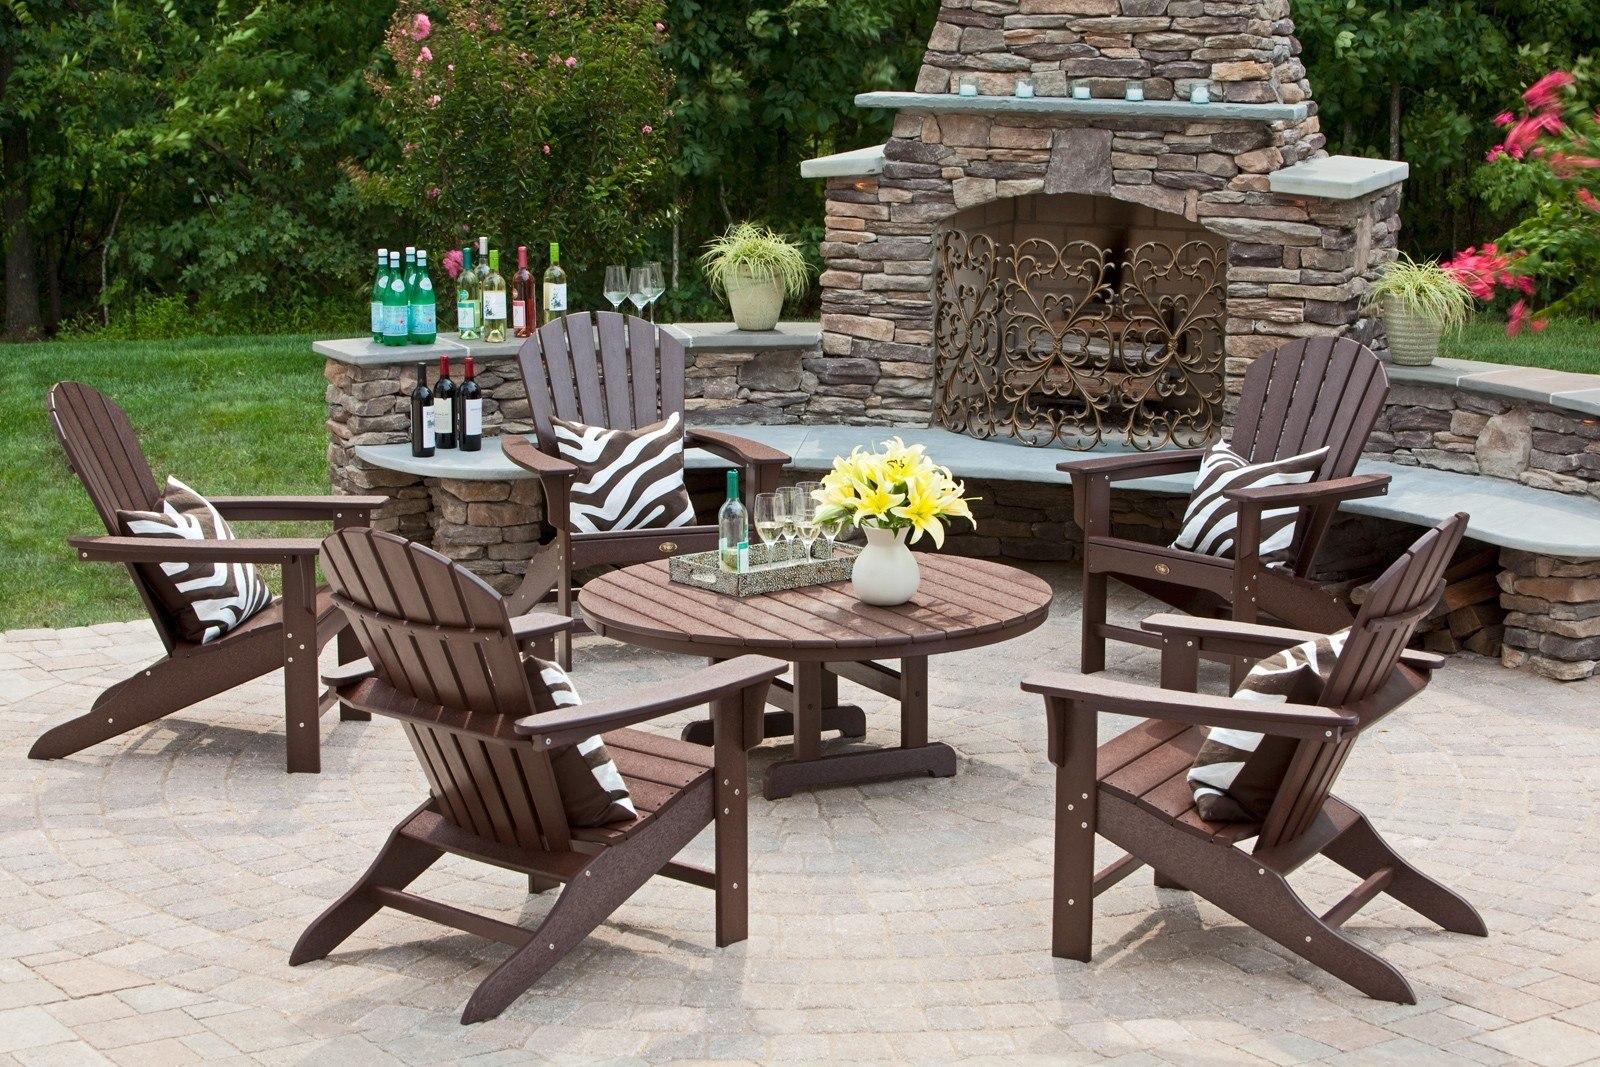 Trex Outdoor Furniture Cape Cod 6